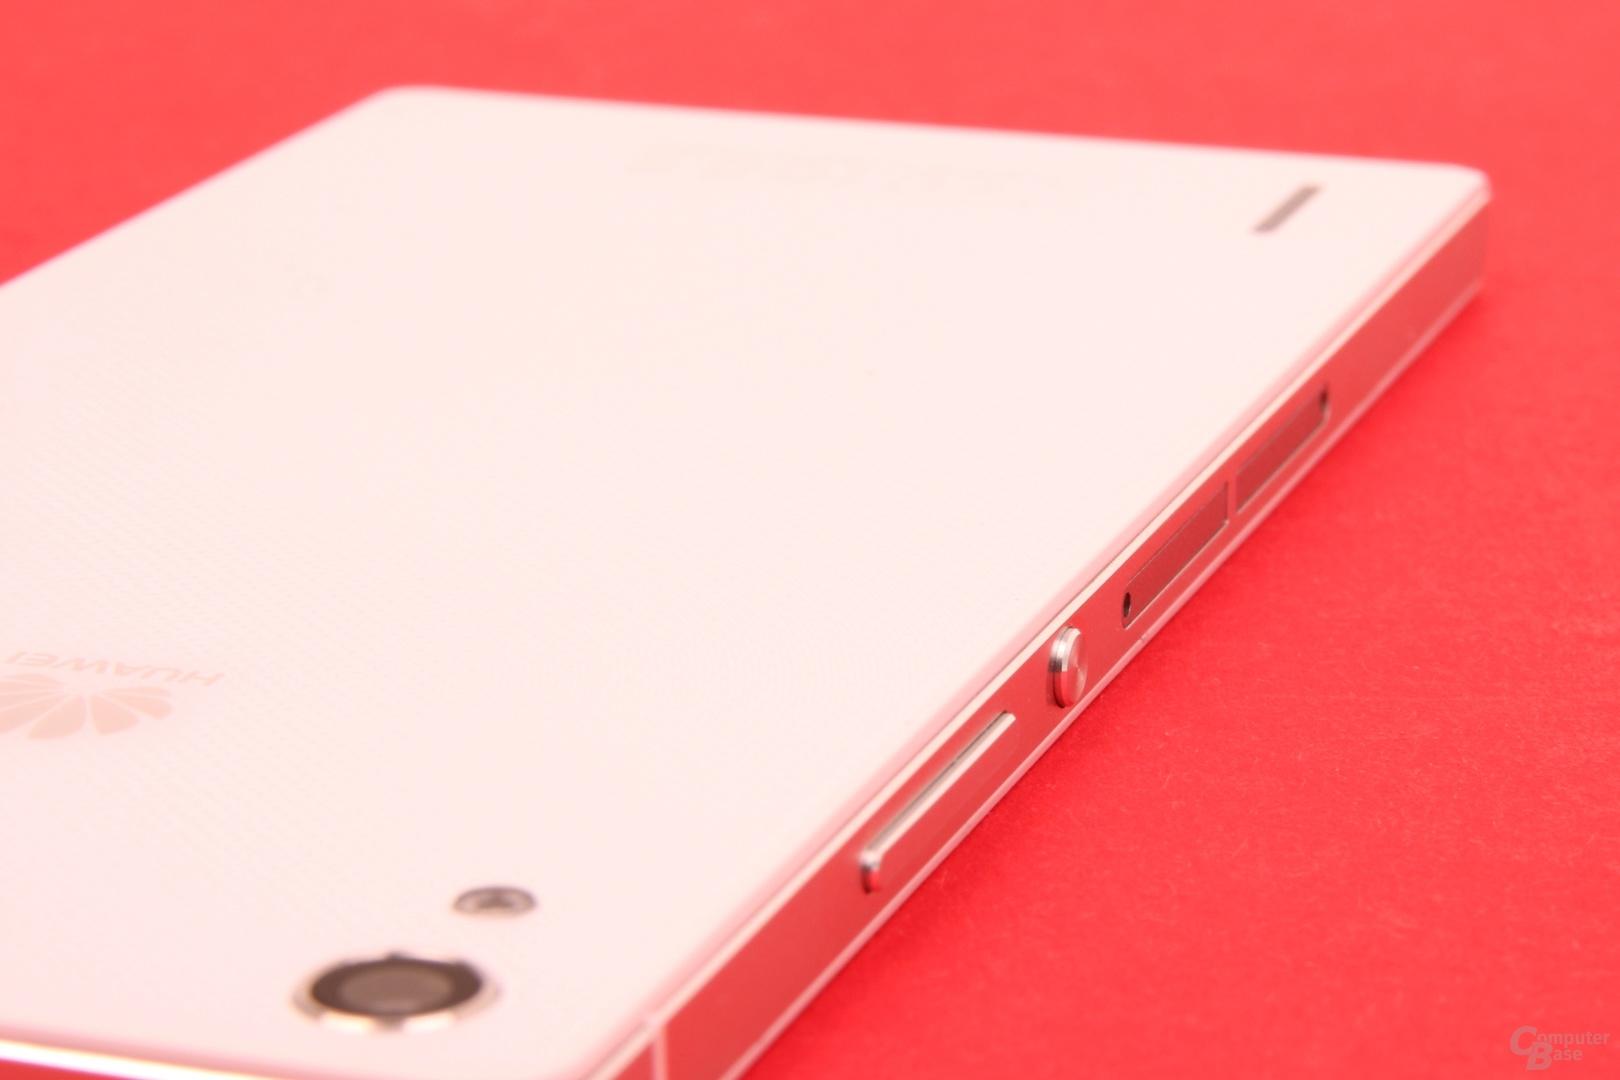 Huawei Ascend P7: Rückseite mit feinem Muster